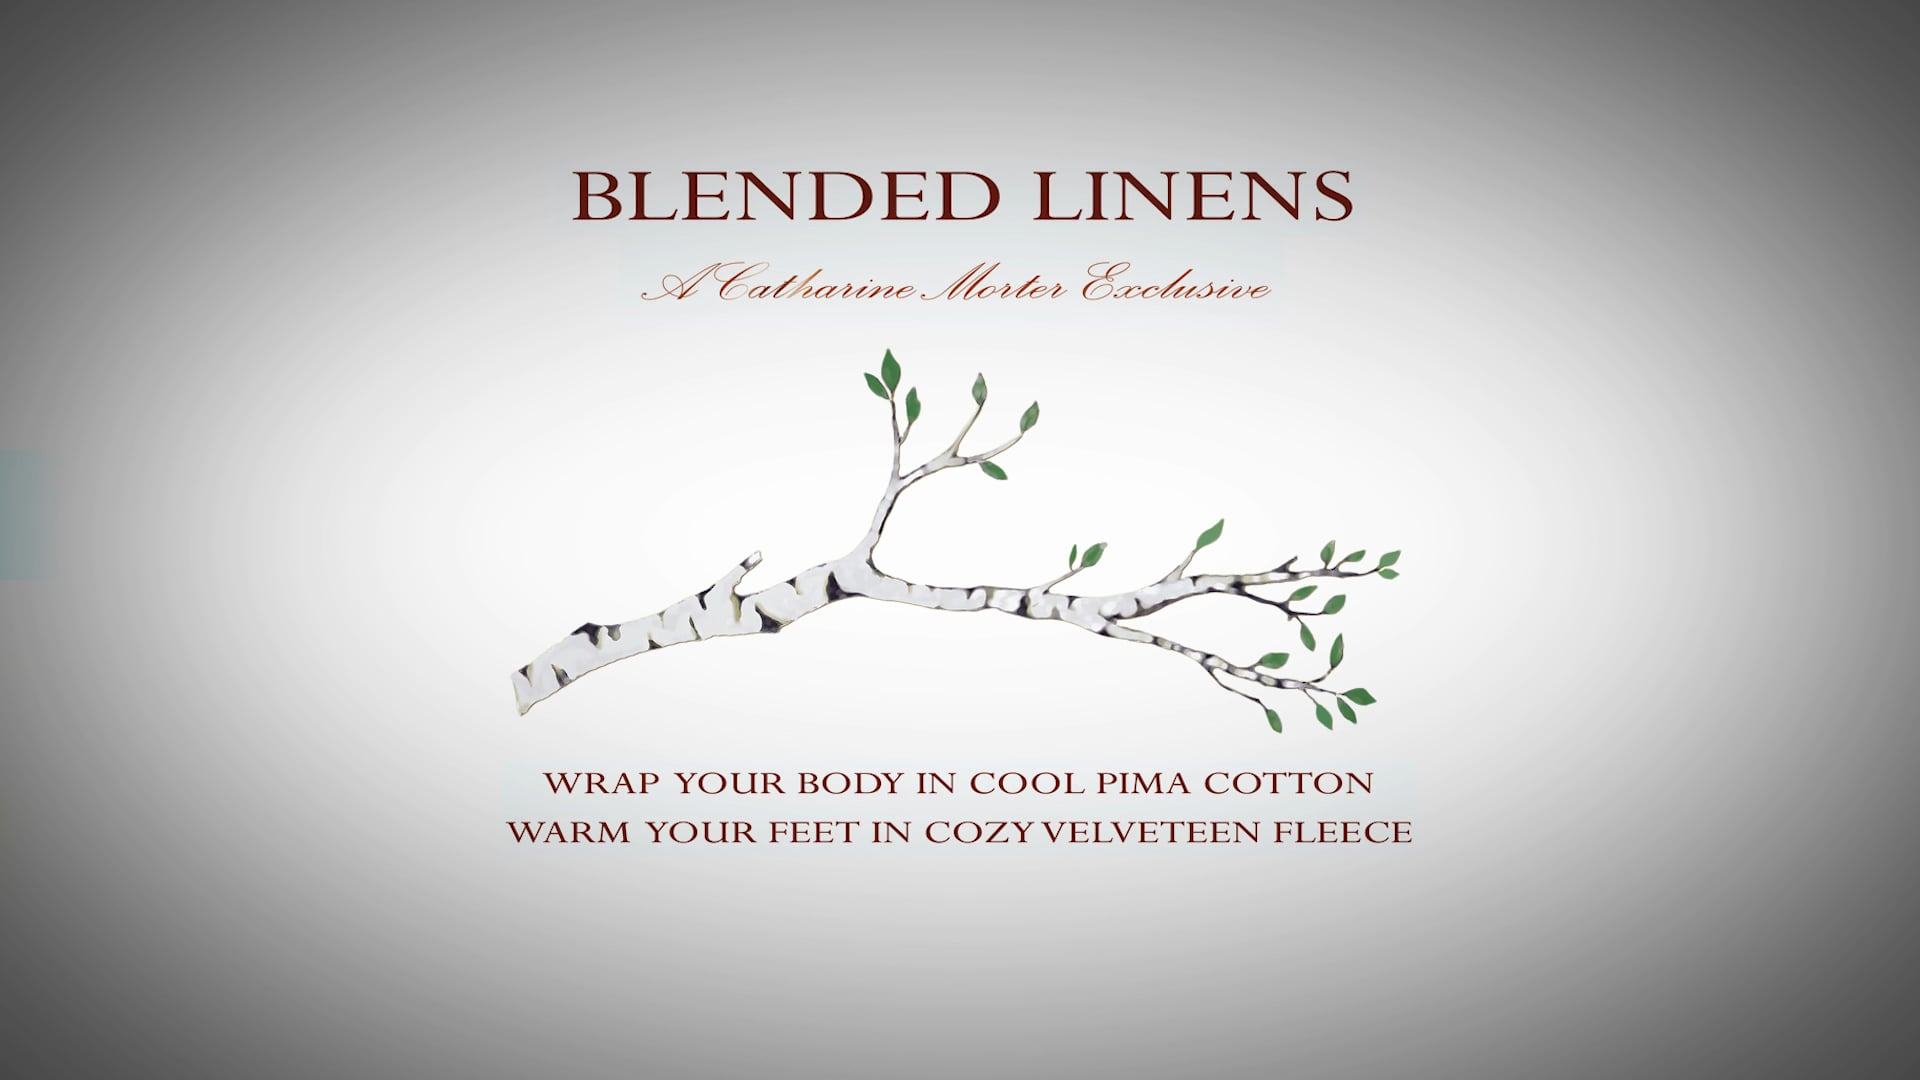 Blended Linens Promotional Video